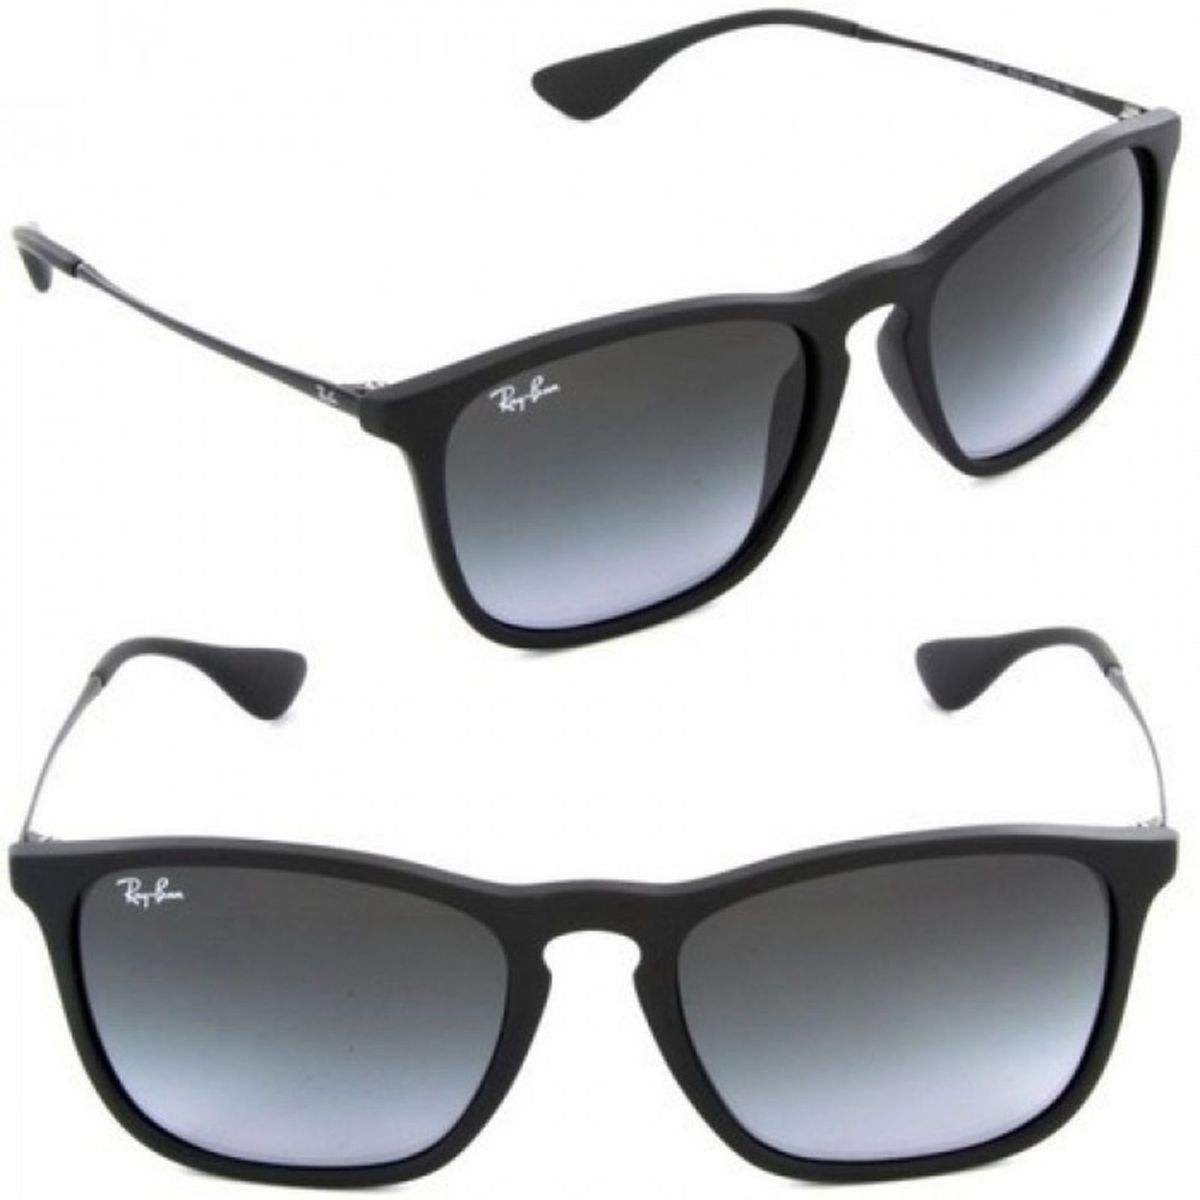 11ab75fb50c90 Oculos de Sol Ray-ban Chris Preto Degrade Polarizado Masculino Feminino